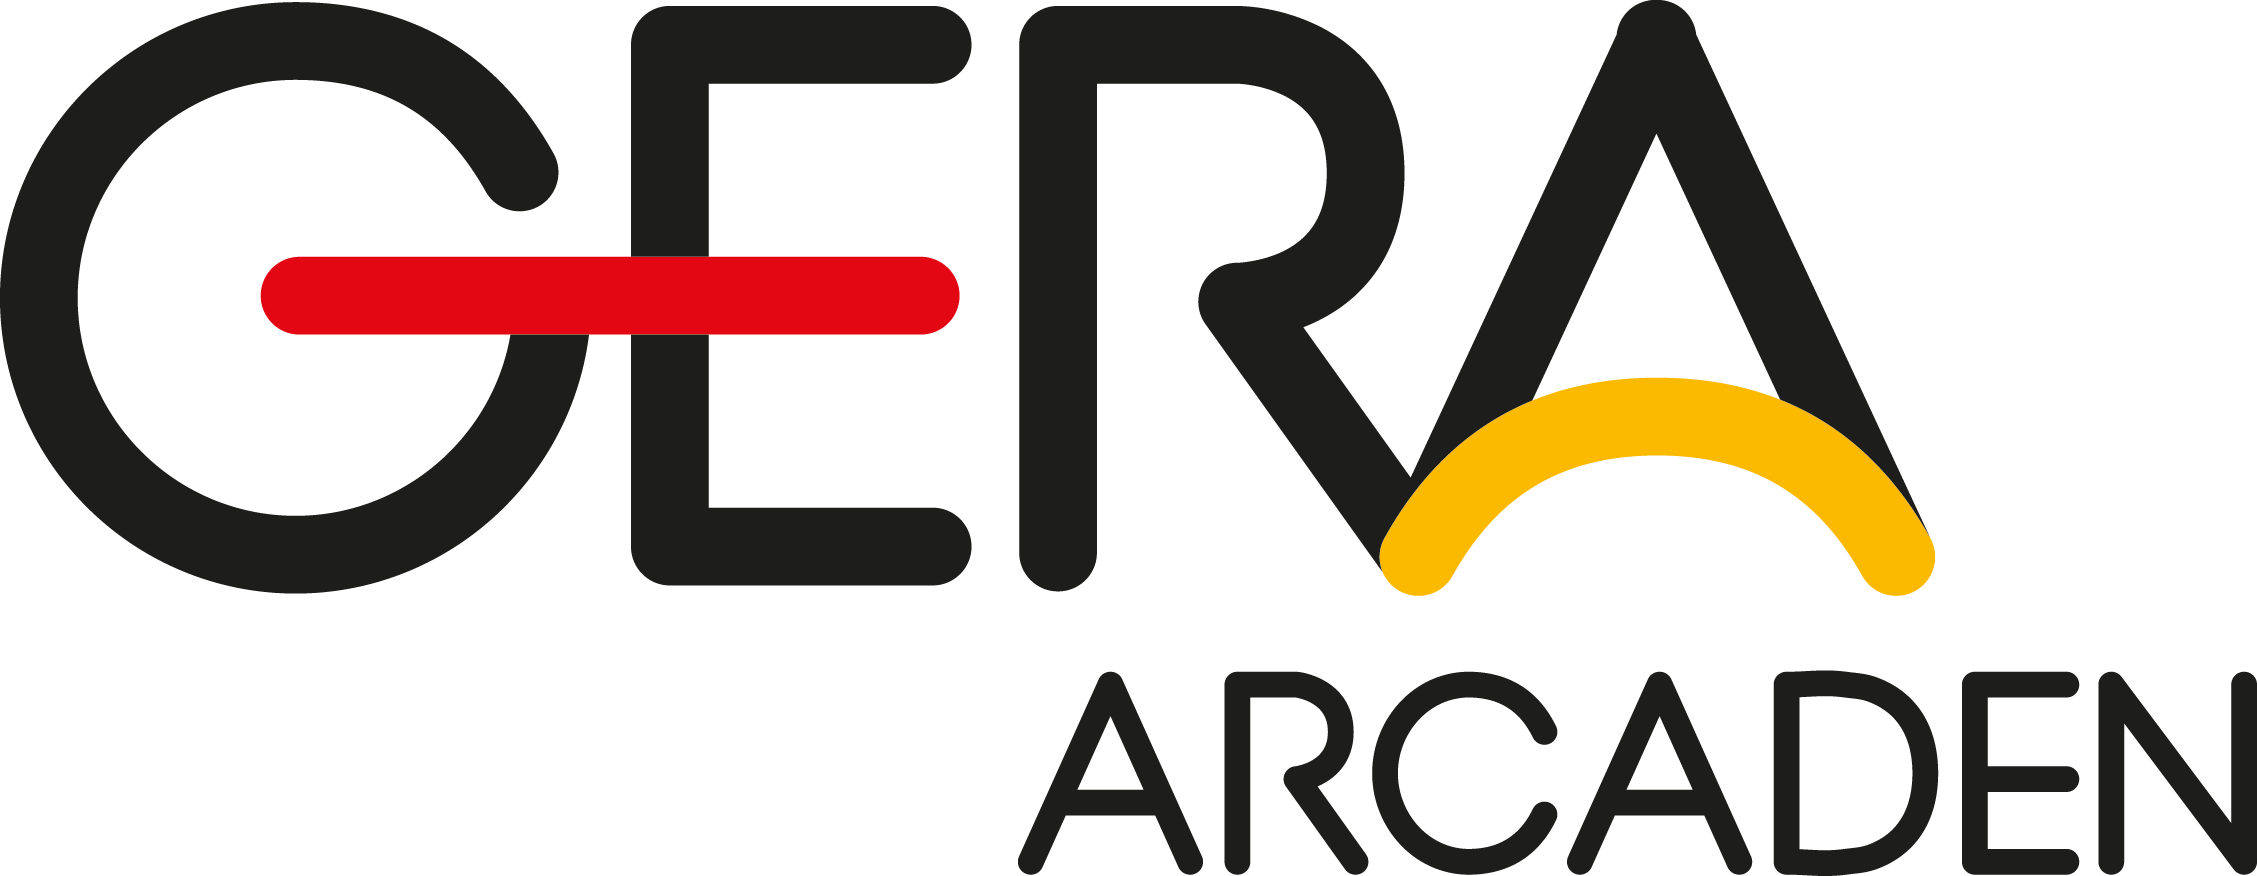 Gera Arcaden Logo